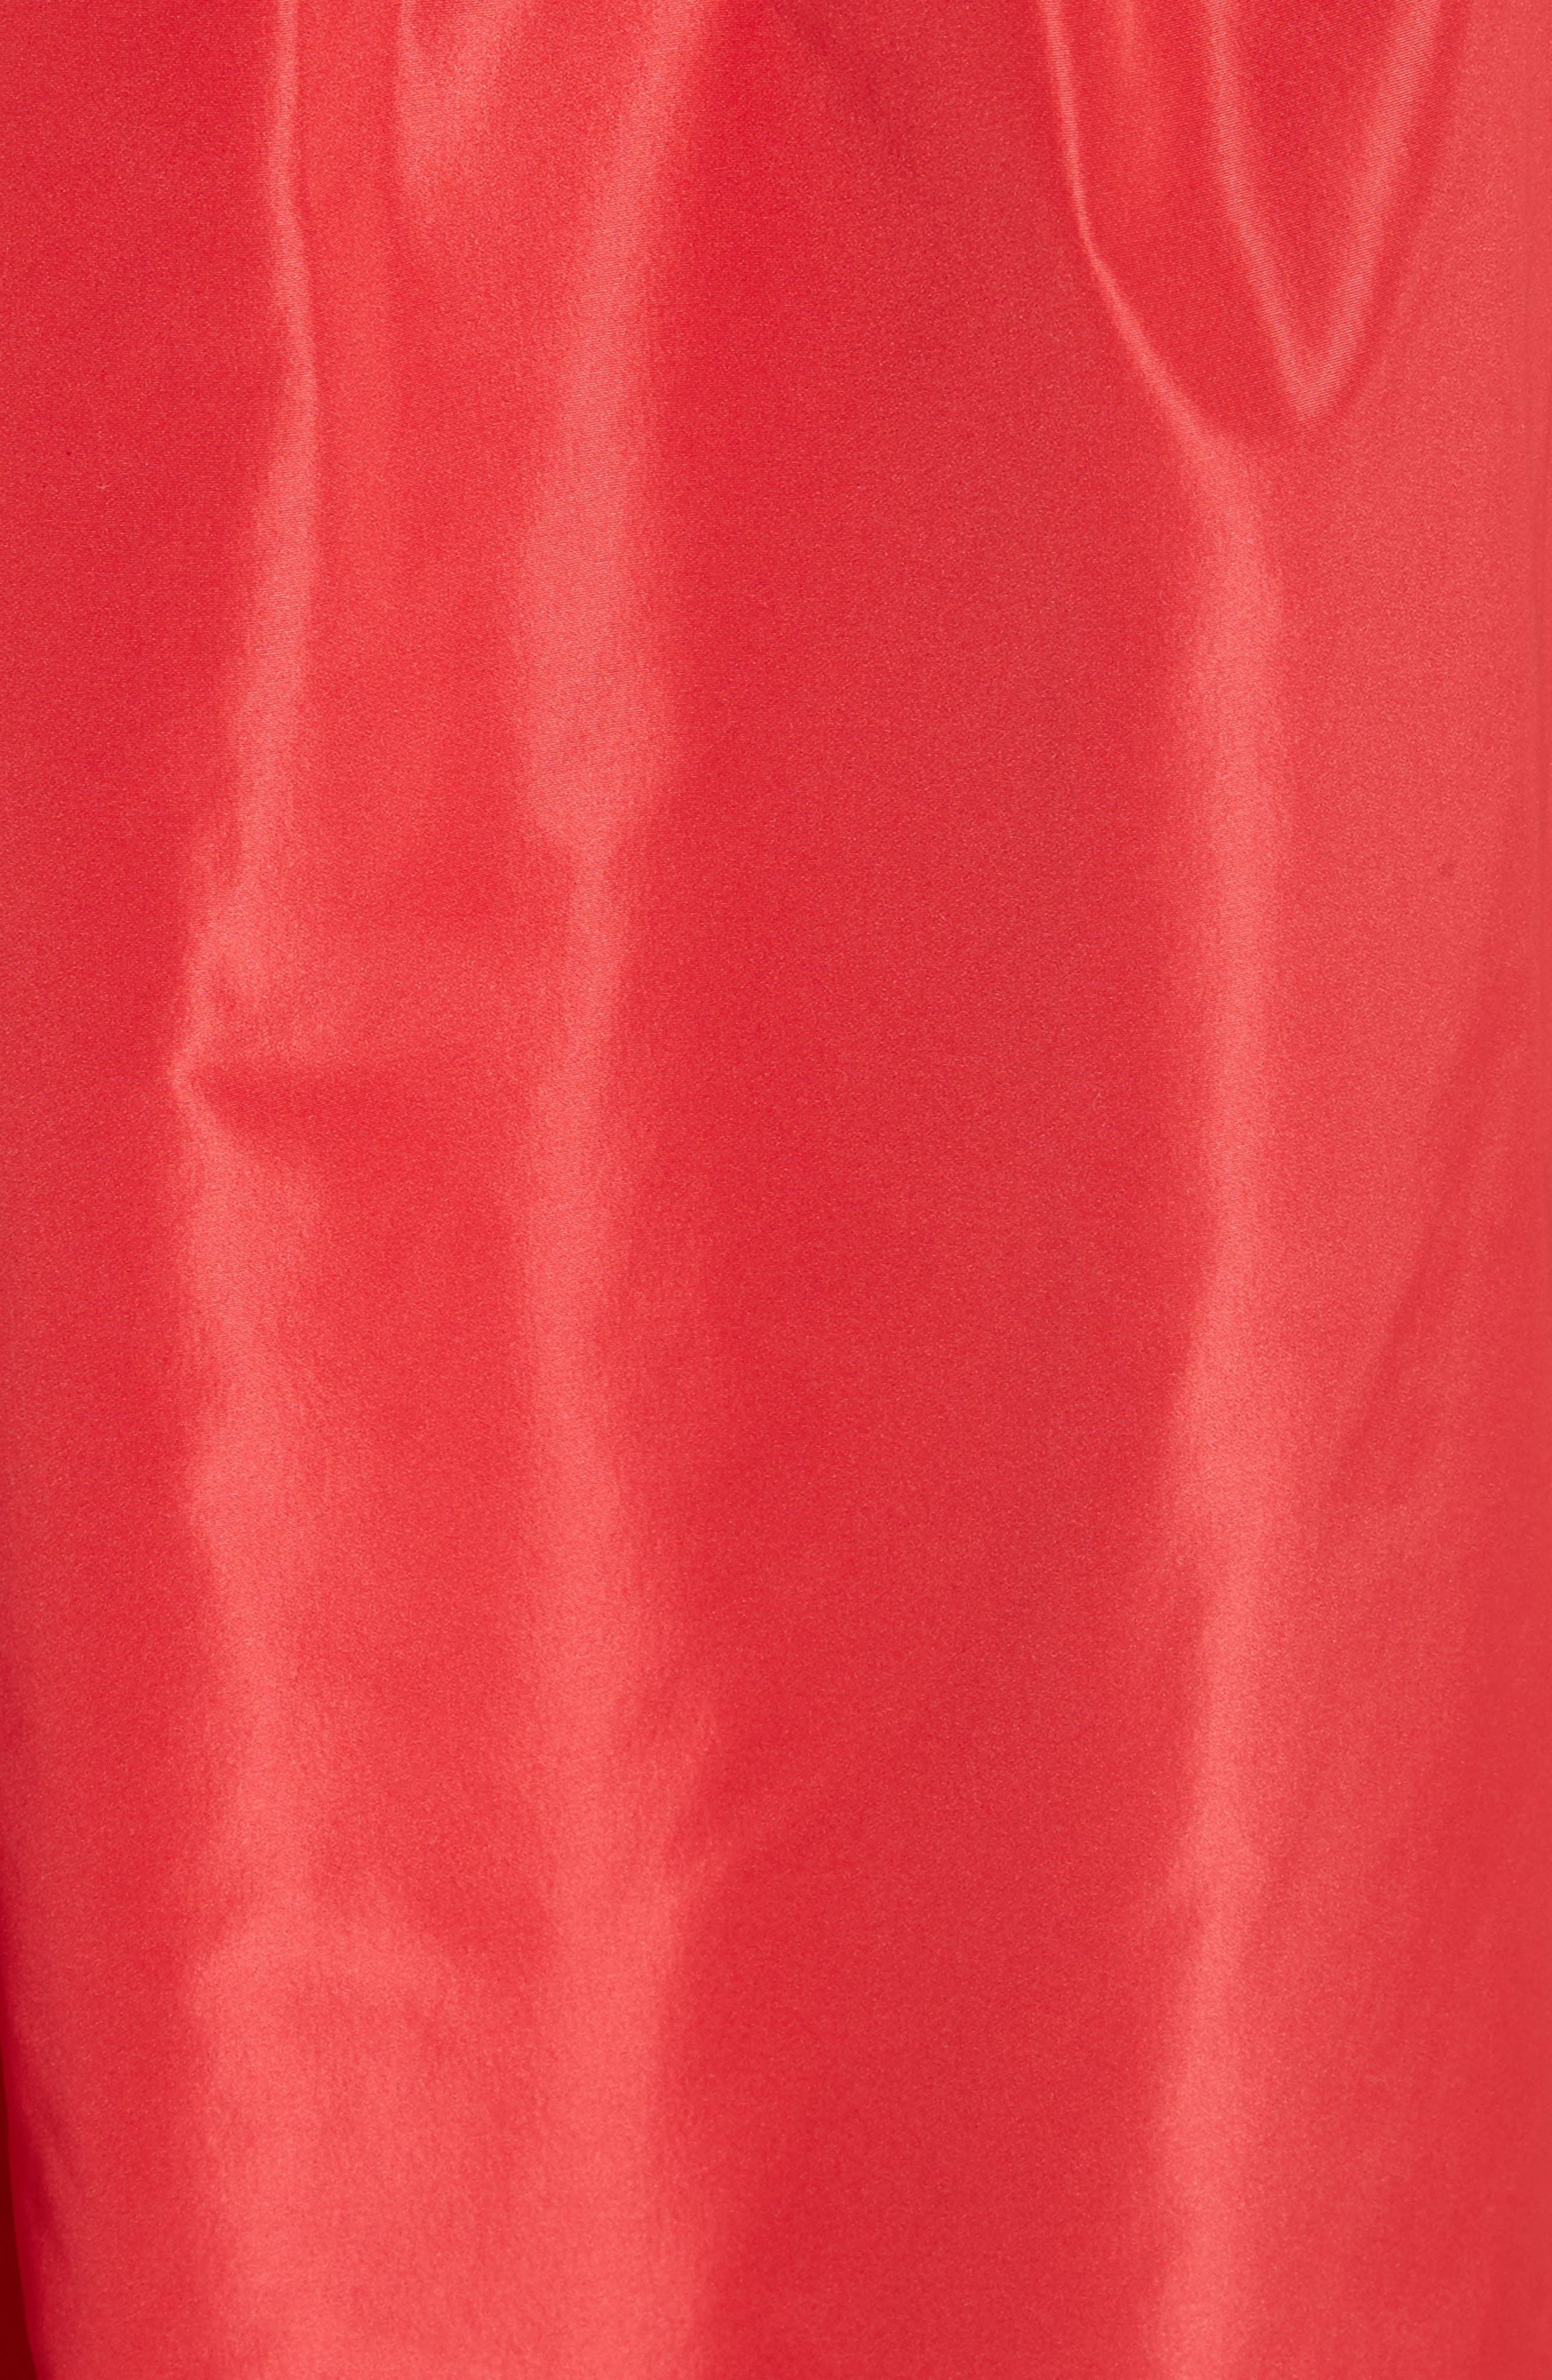 One-Shoulder Ruffle Taffeta Dress,                             Alternate thumbnail 5, color,